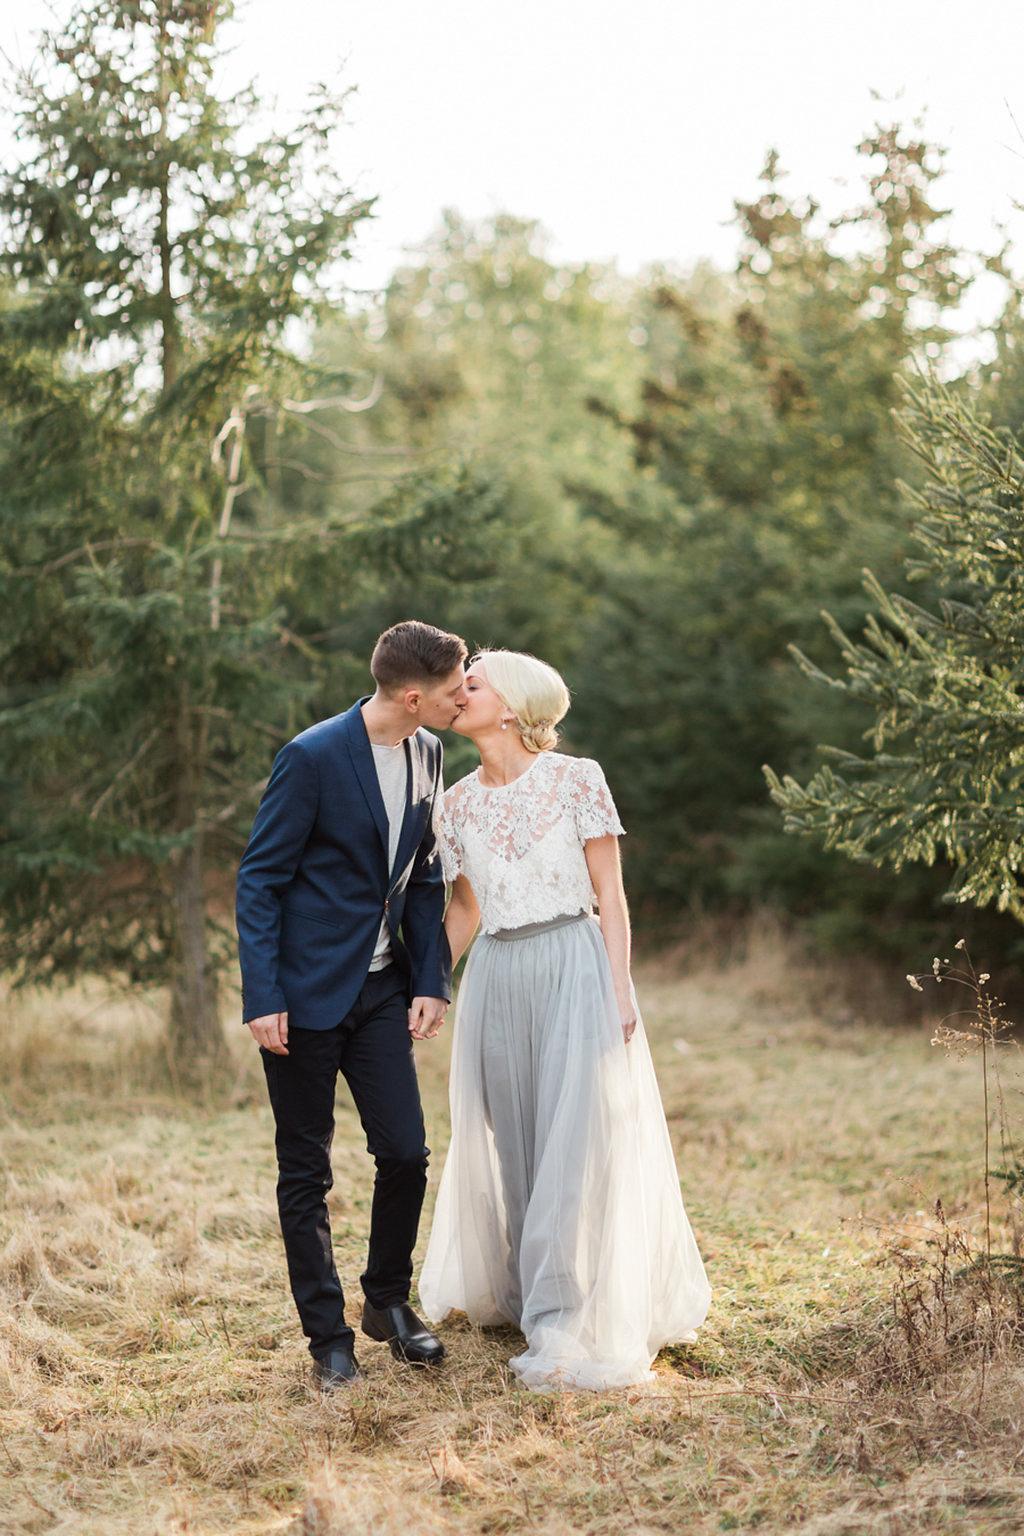 kayla-yestal-photography-vineyard-bride-swish-list-beamer-falls-manor-grimsby-engagement-1.jpg